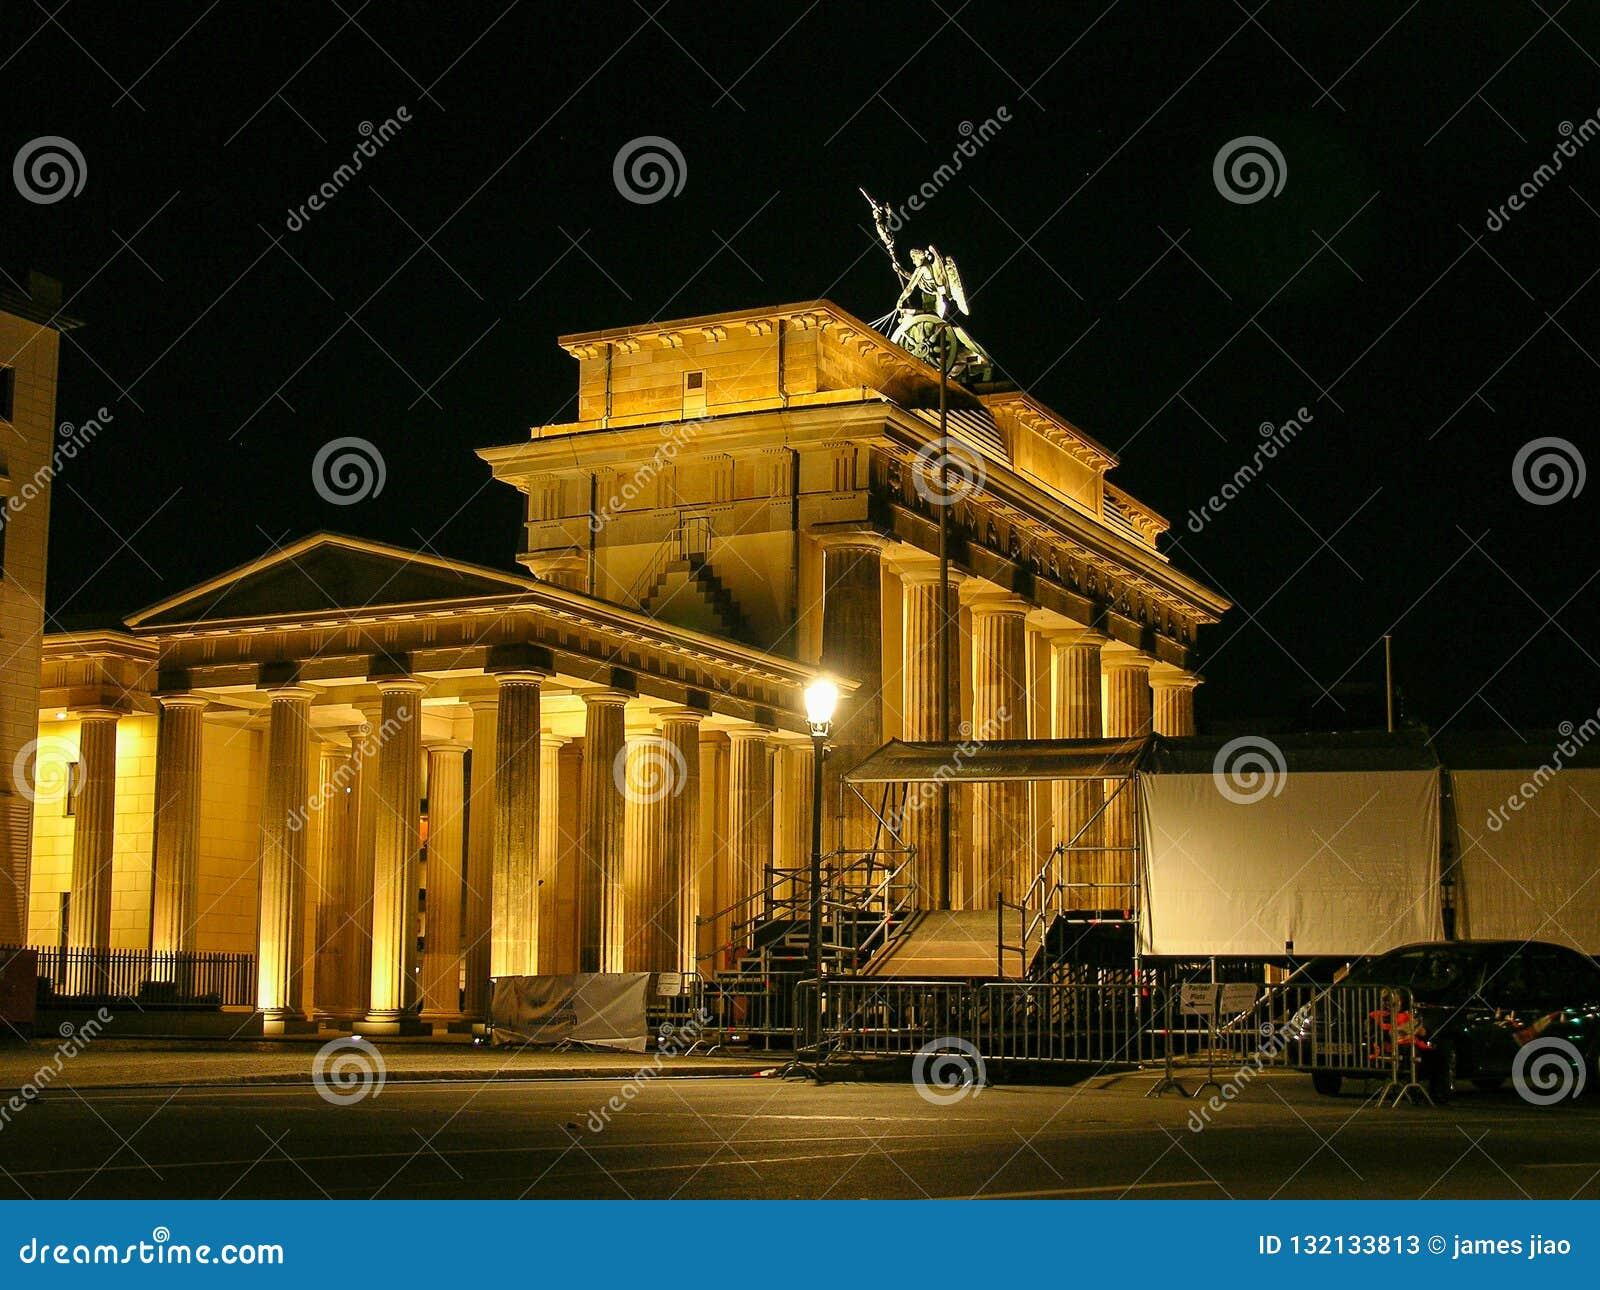 Historic buildings in Berlin Brandenburger Tor - Brandeburg gate